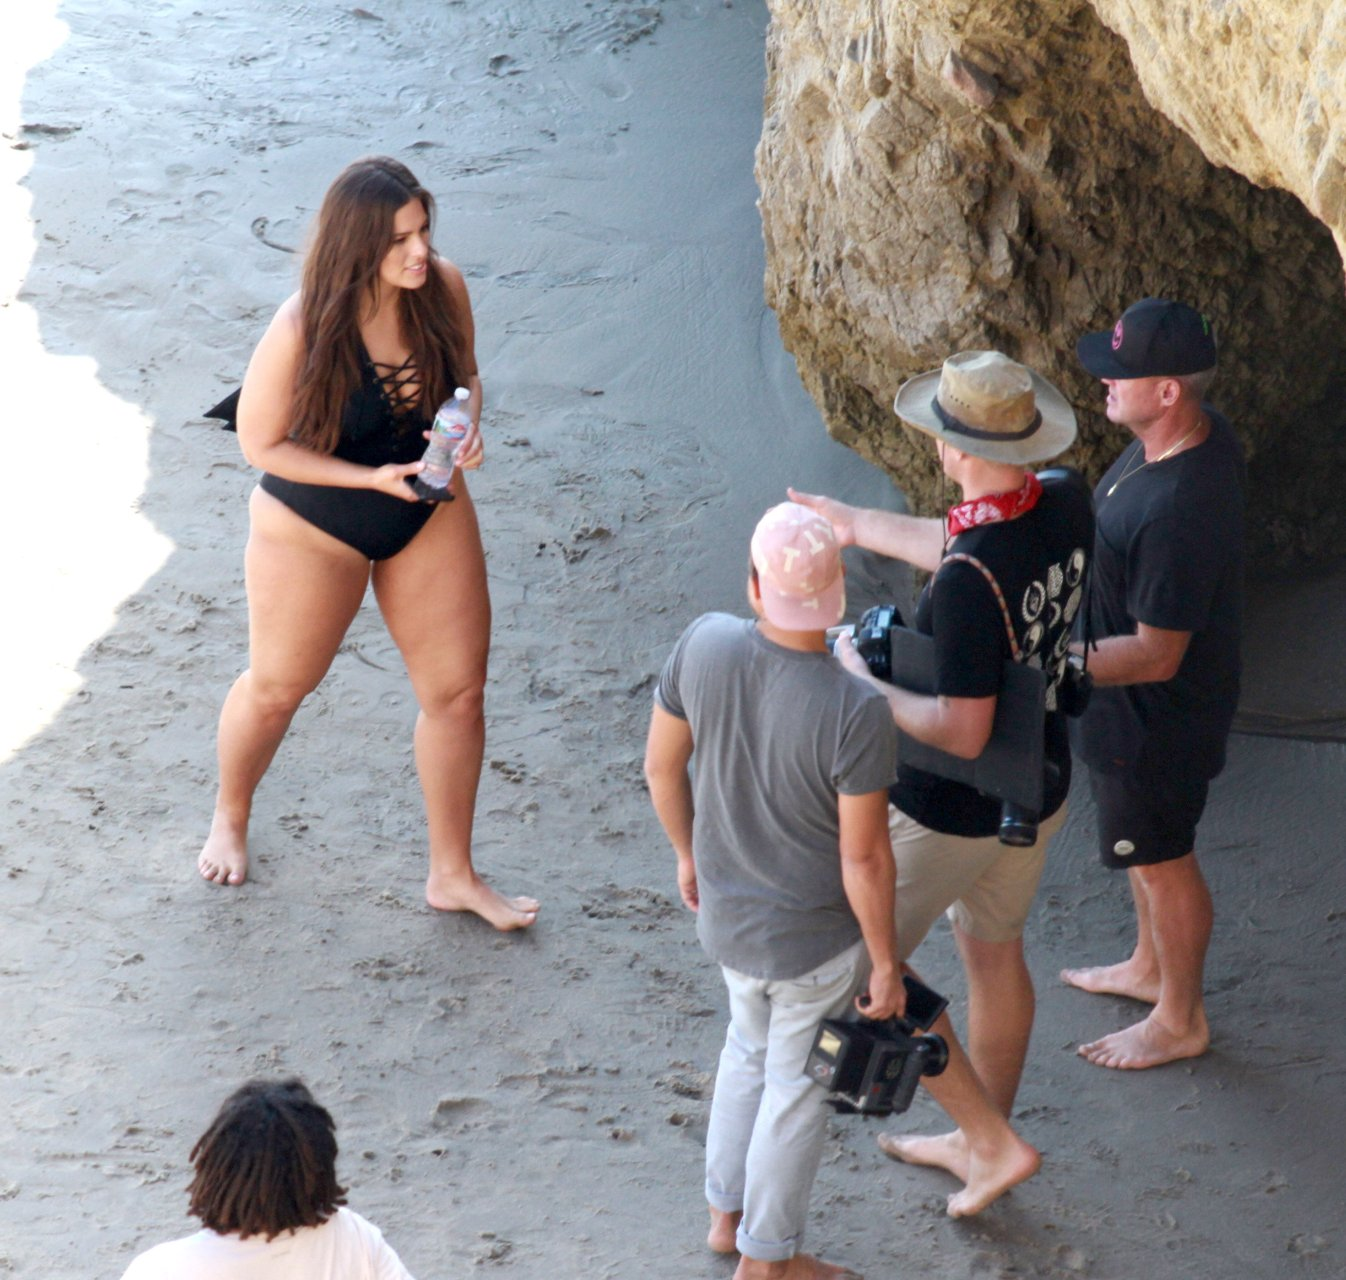 Ashley-Graham-Sexy-TheFappeningBlog.com-35.jpg